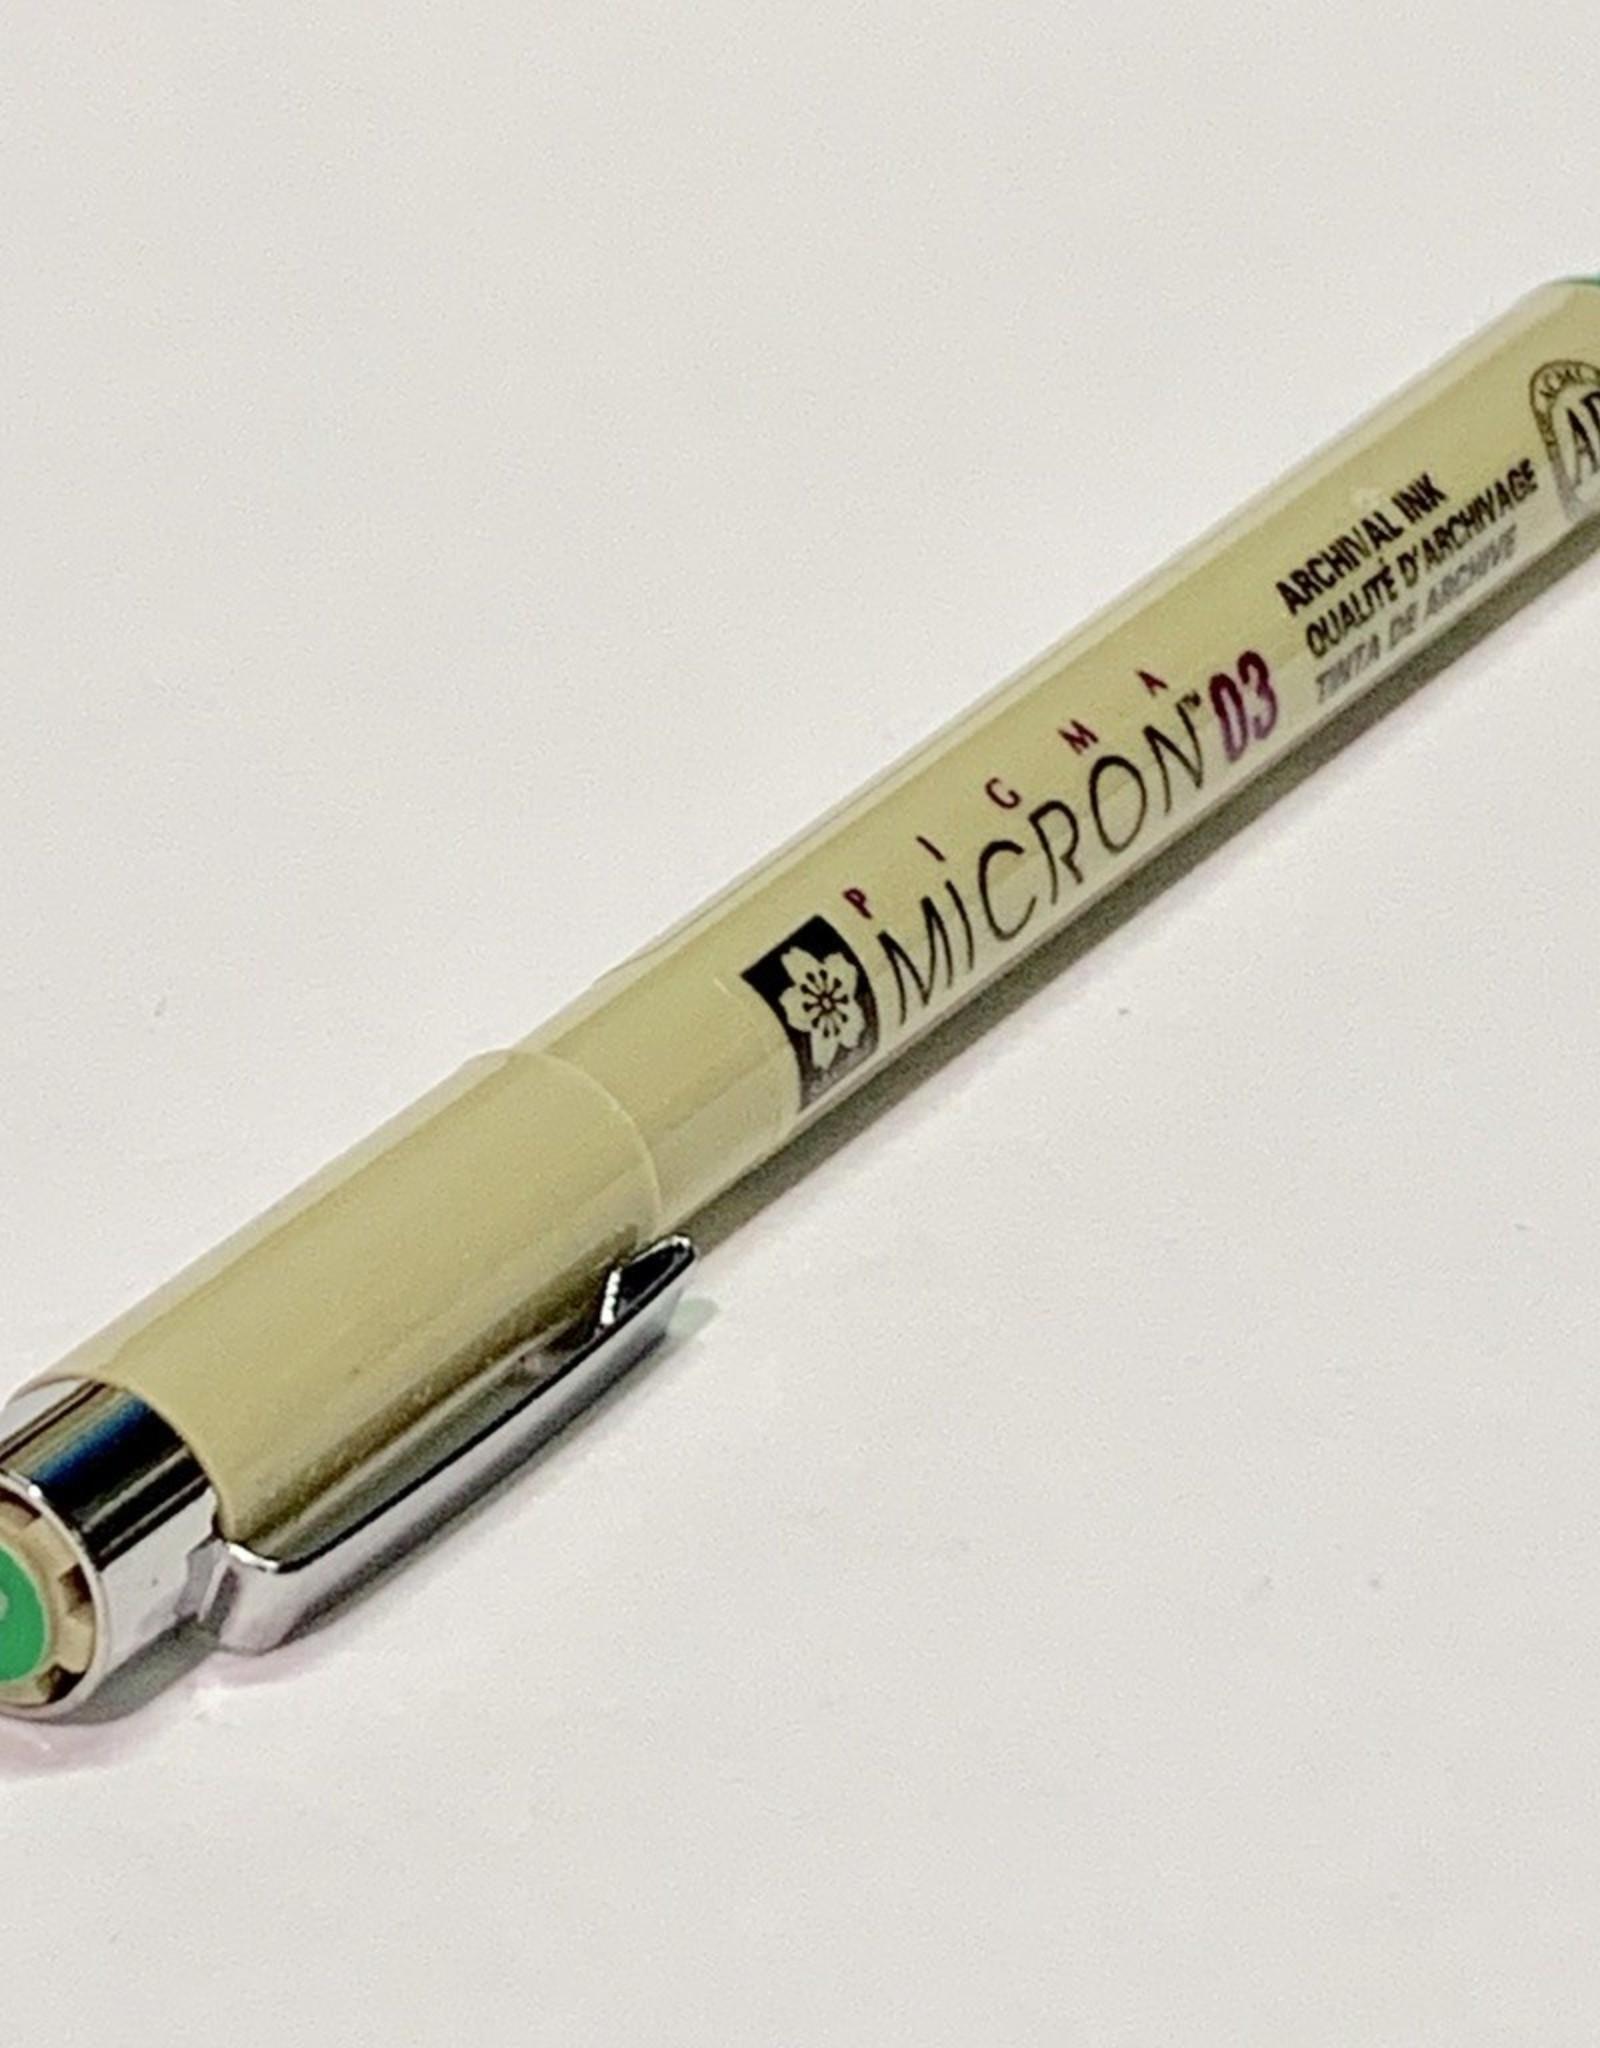 Sakura Micron Green Pen 03 .35mm